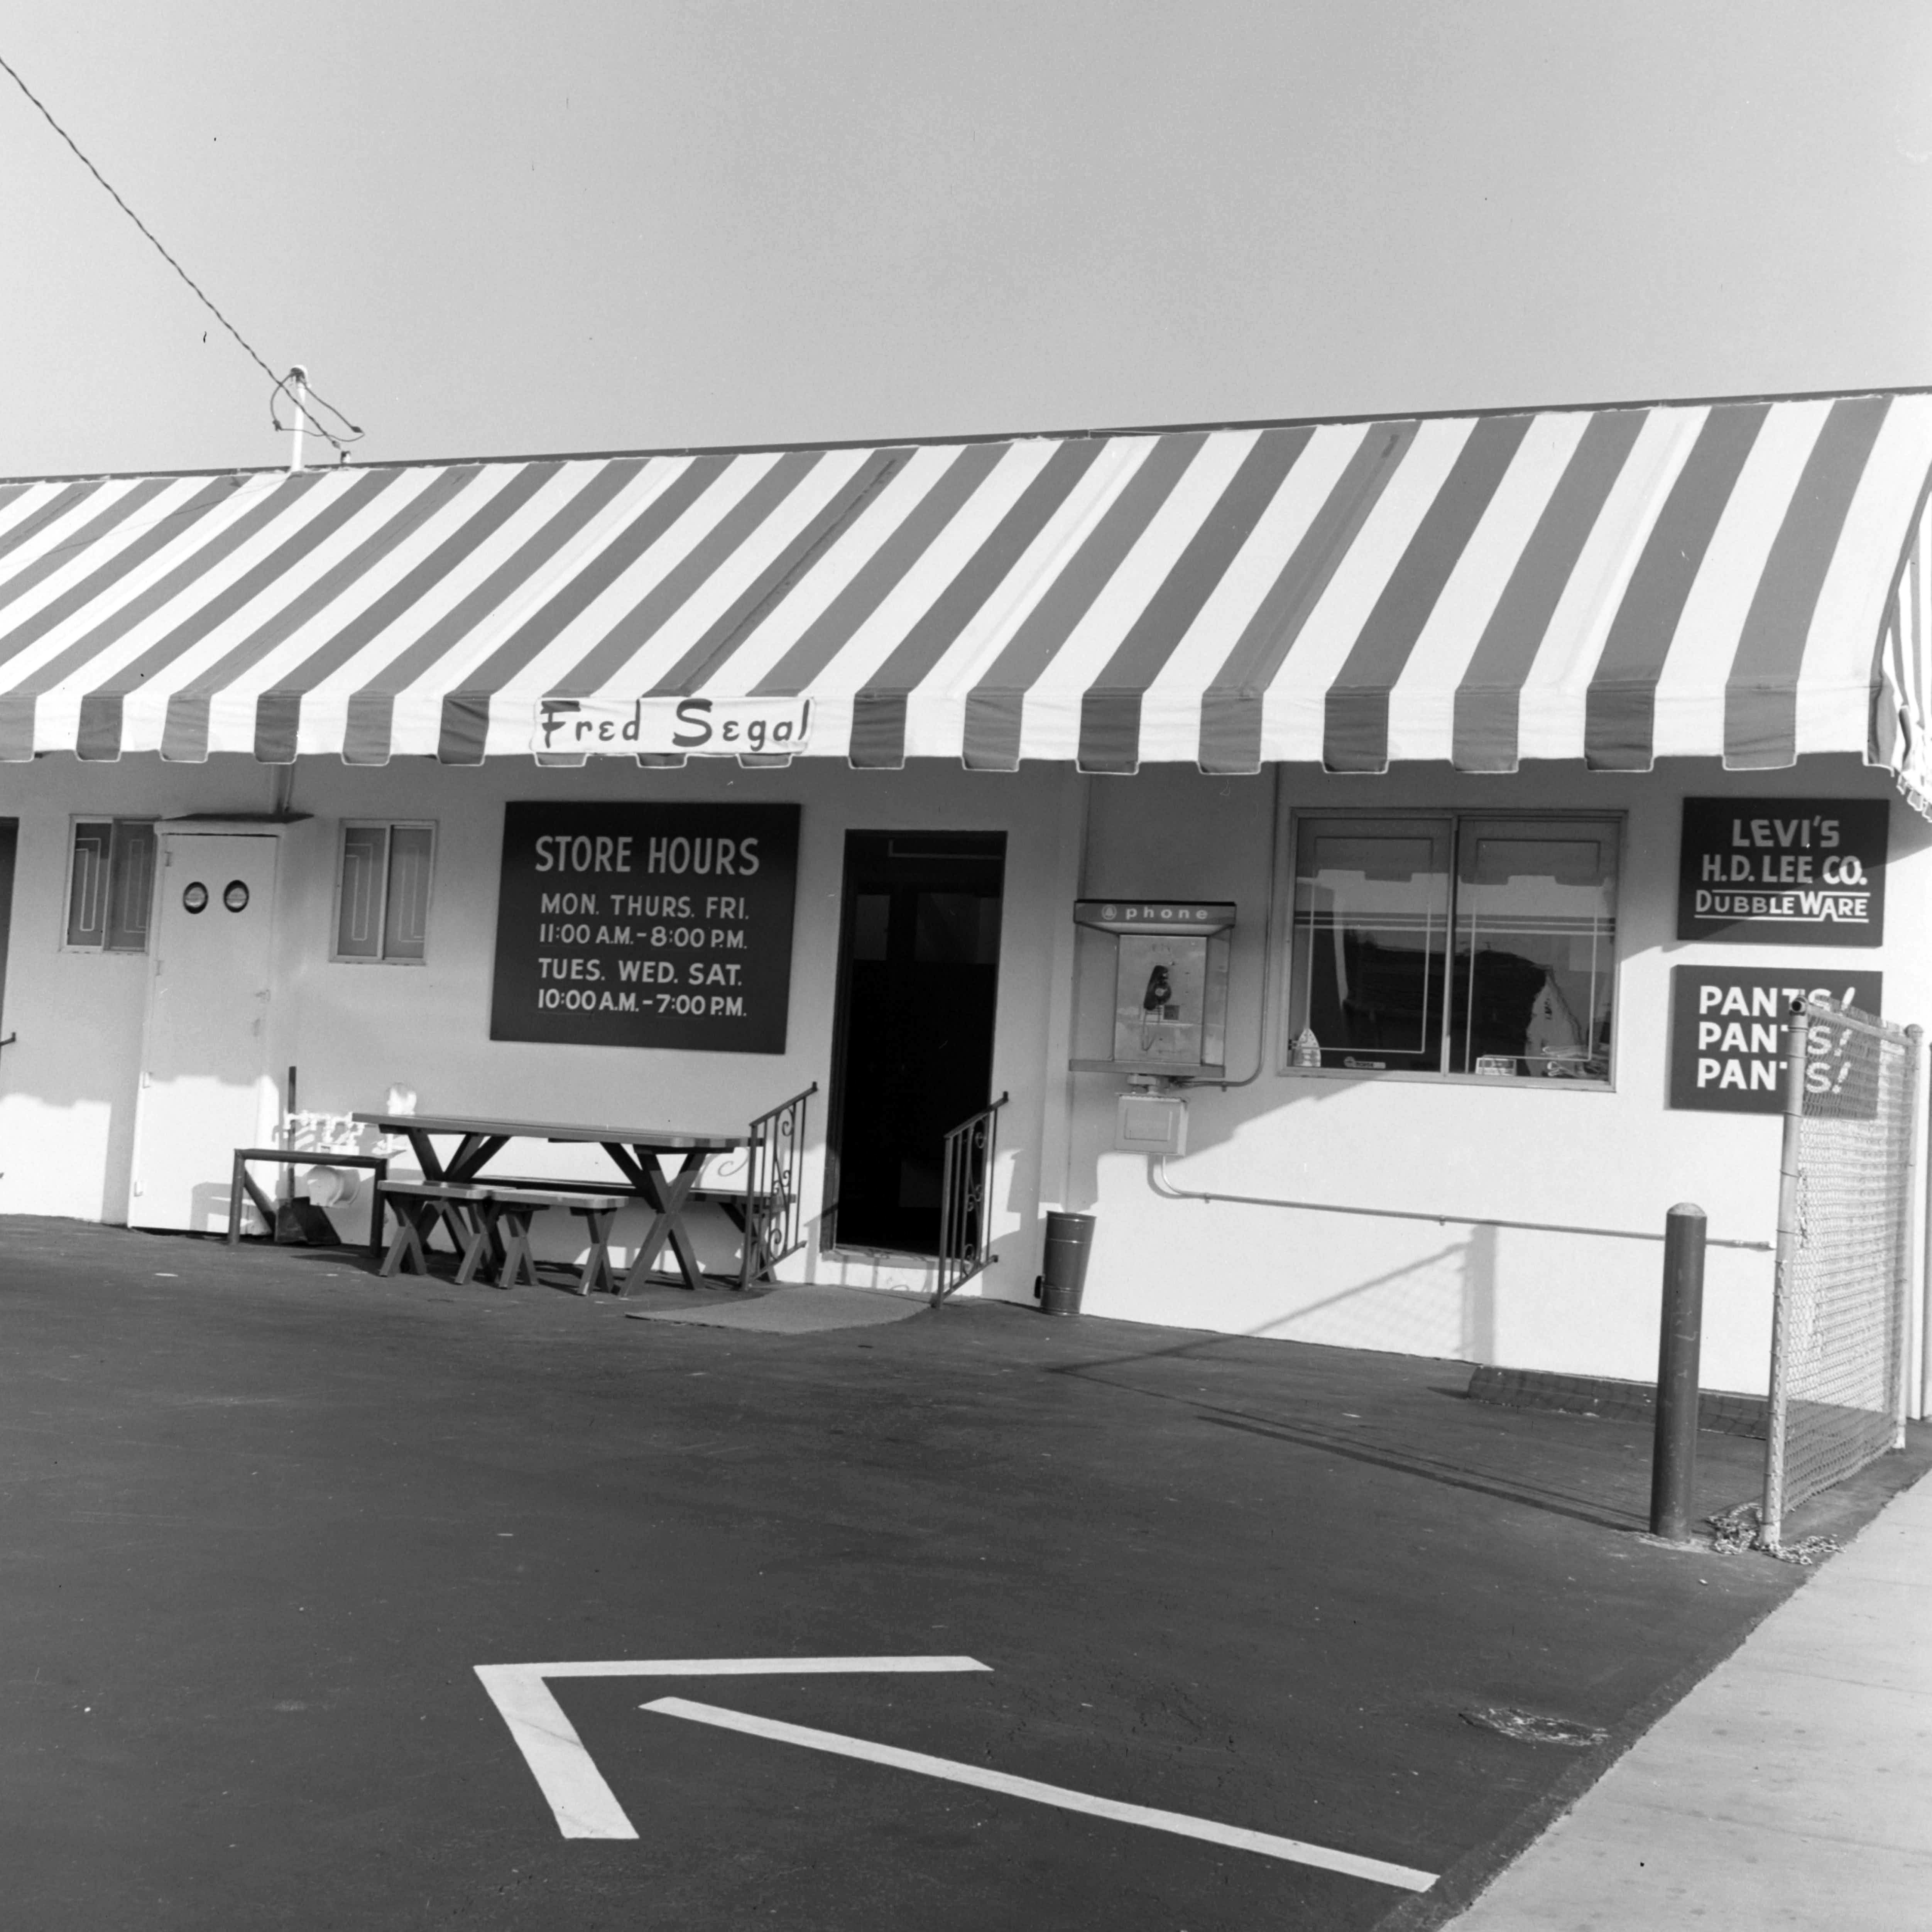 Fred Segal 8100 Melrose Avenue storefront on October 22, 1968 in Los Angeles.